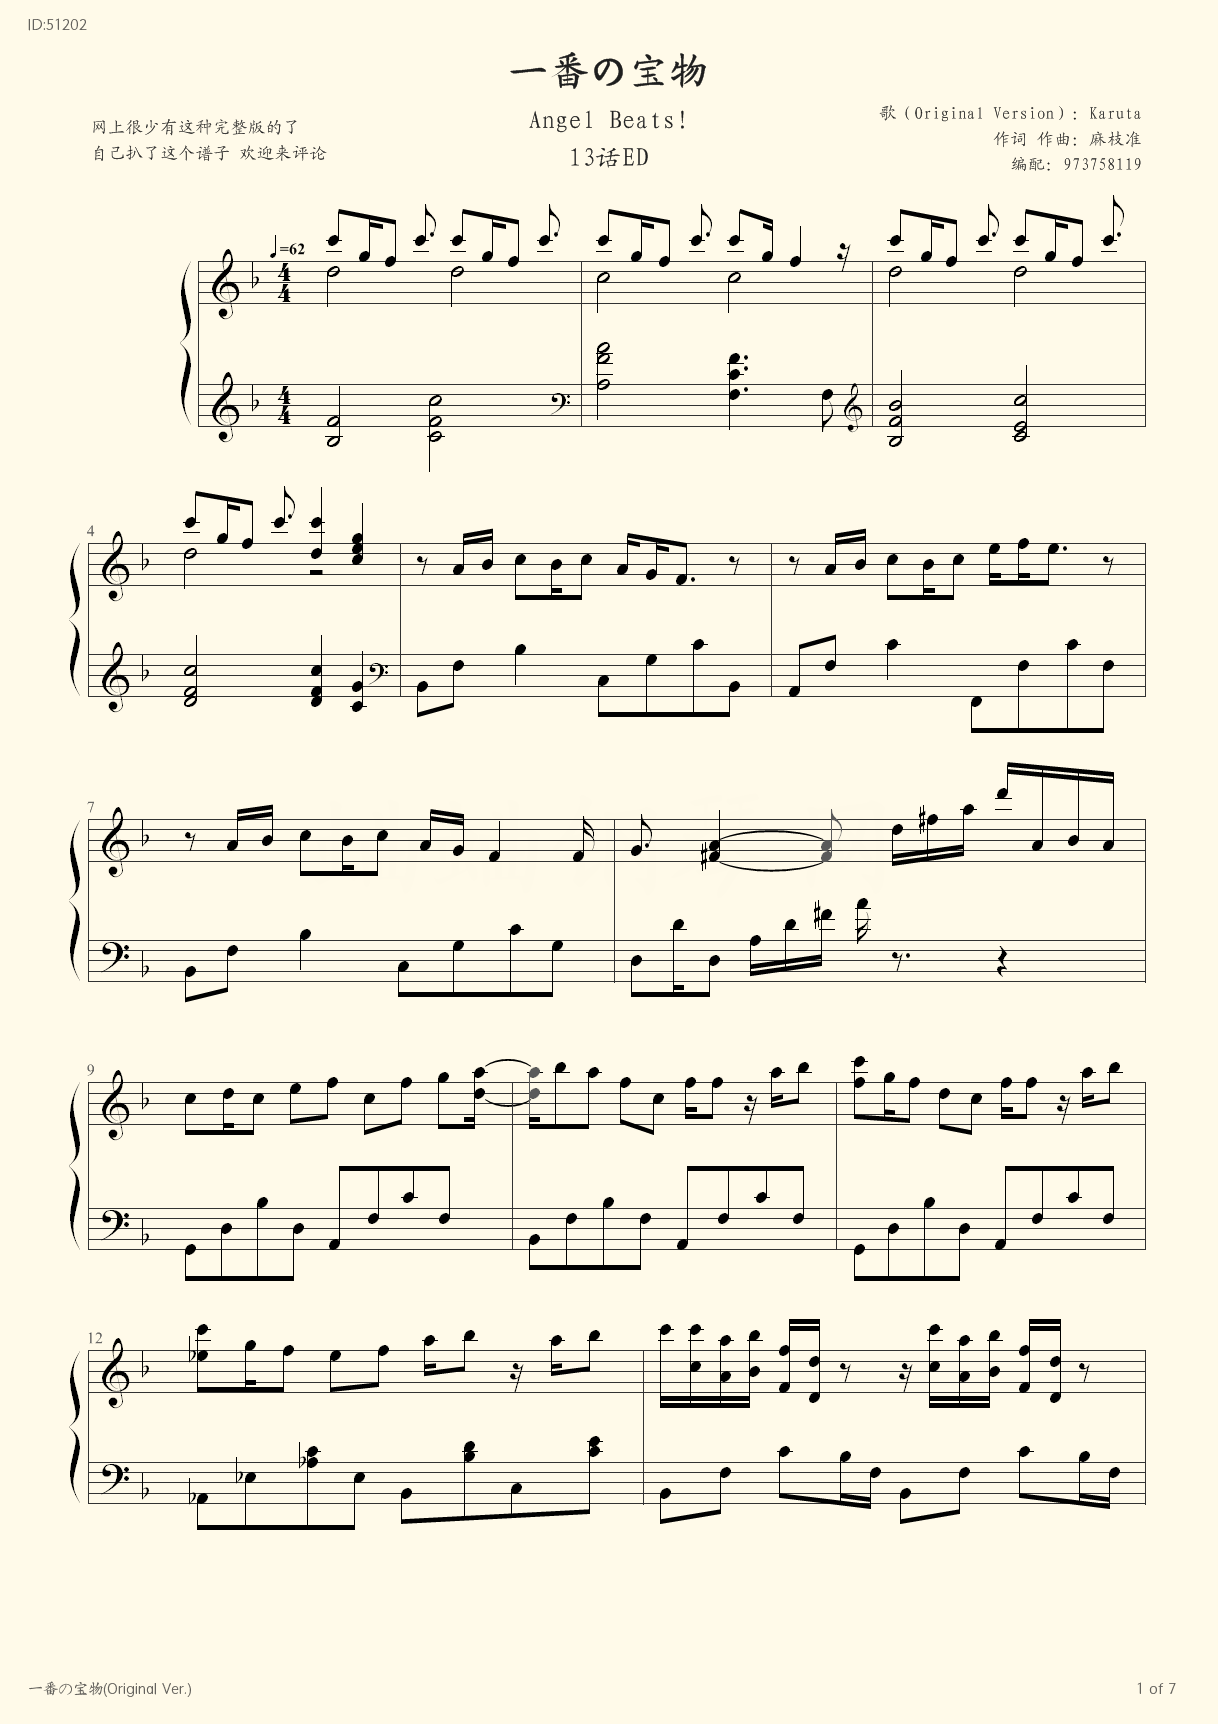 Original Ver -  karuta - first page